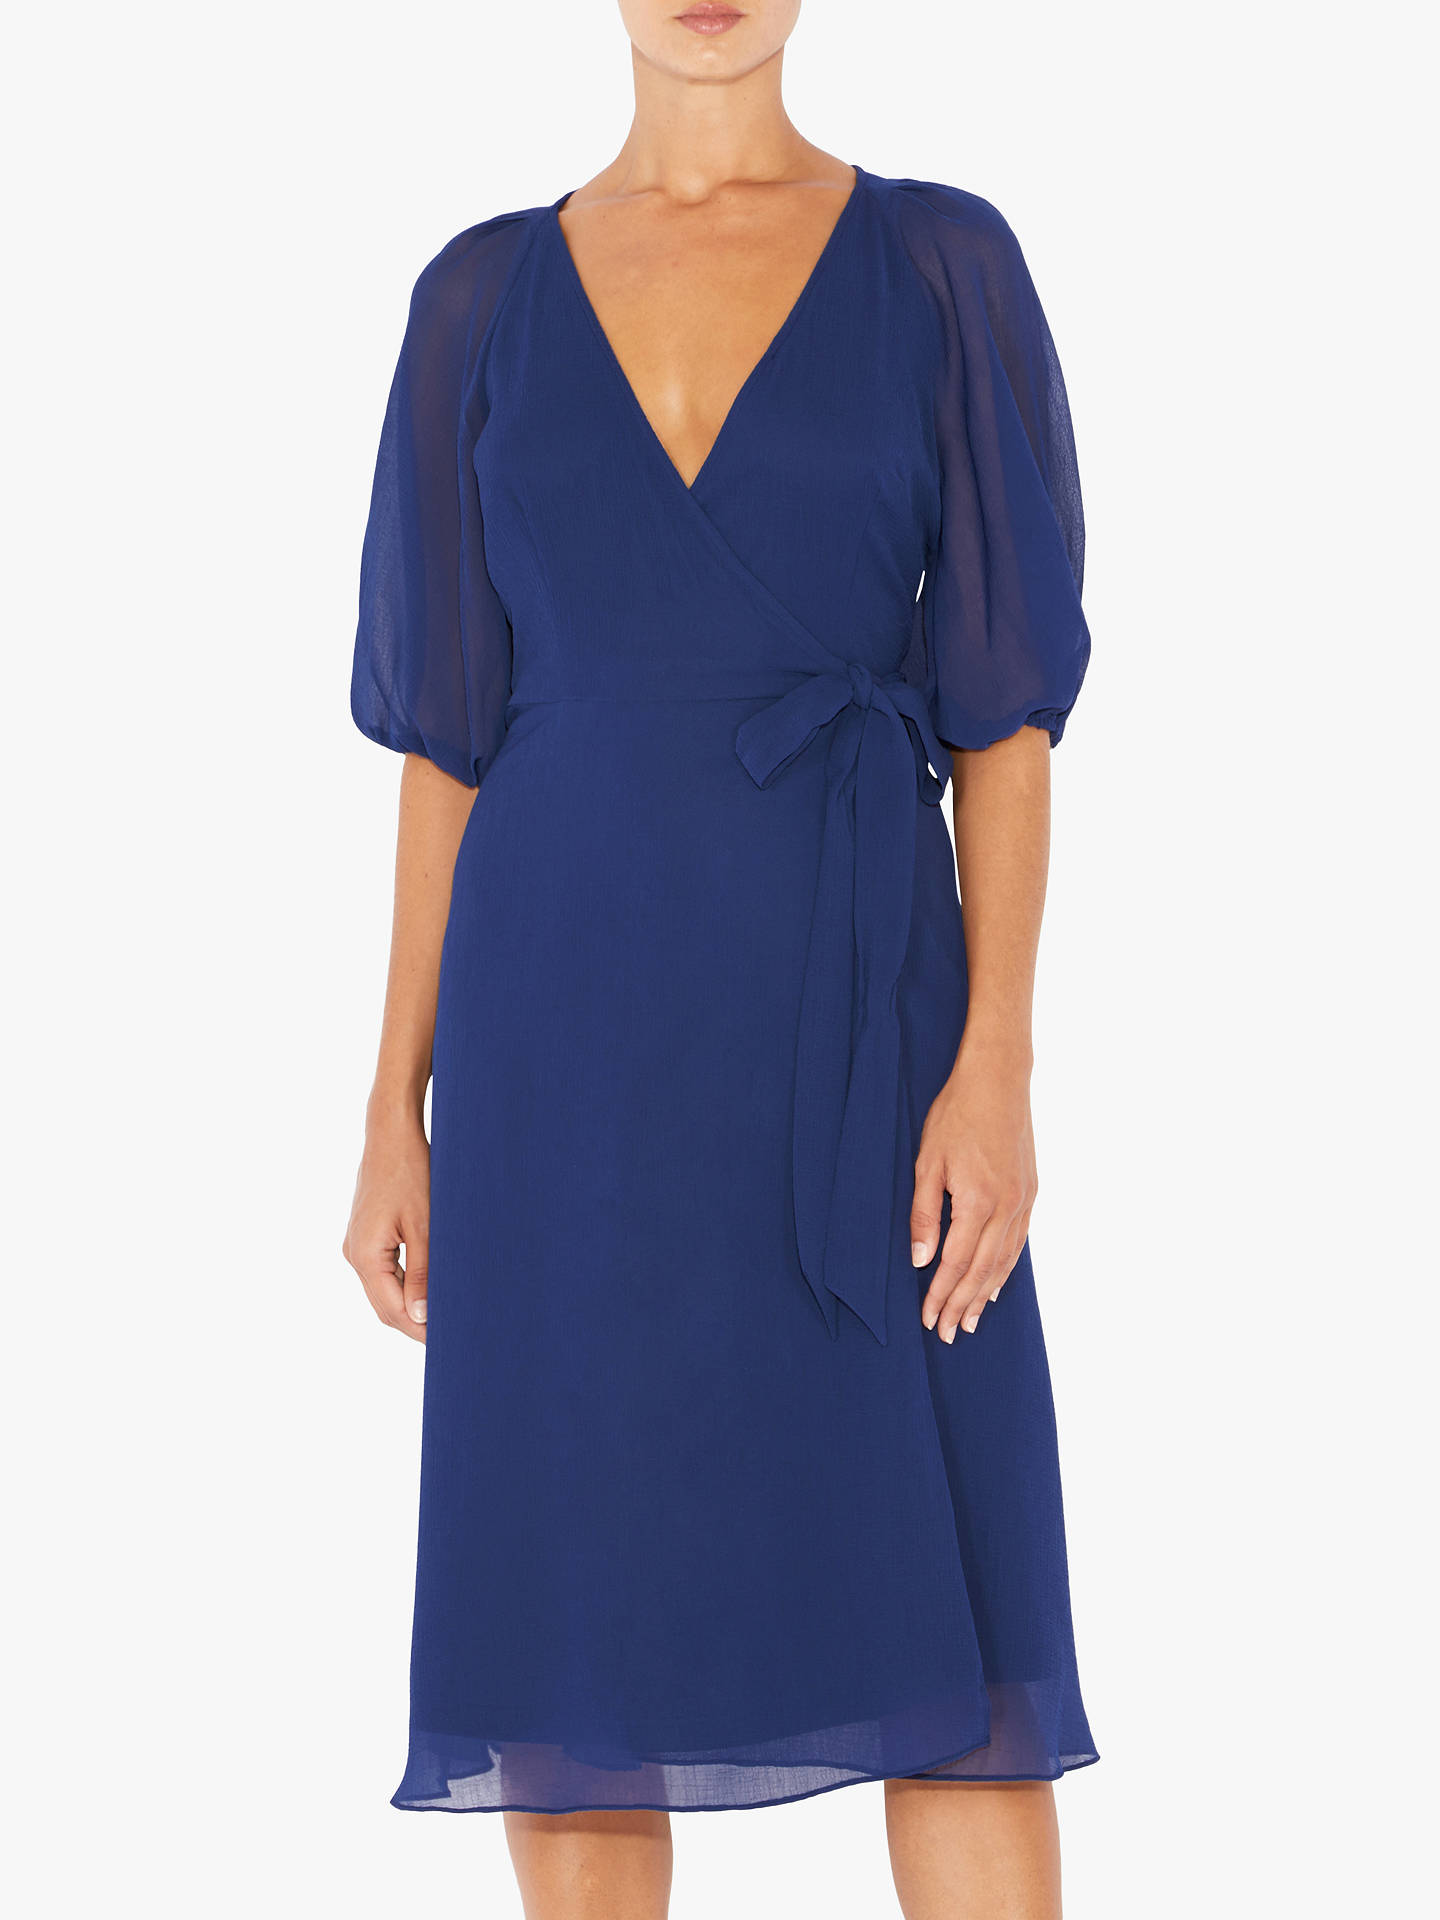 431cdb848ca Adrianna Papell Texture Wrap Dress